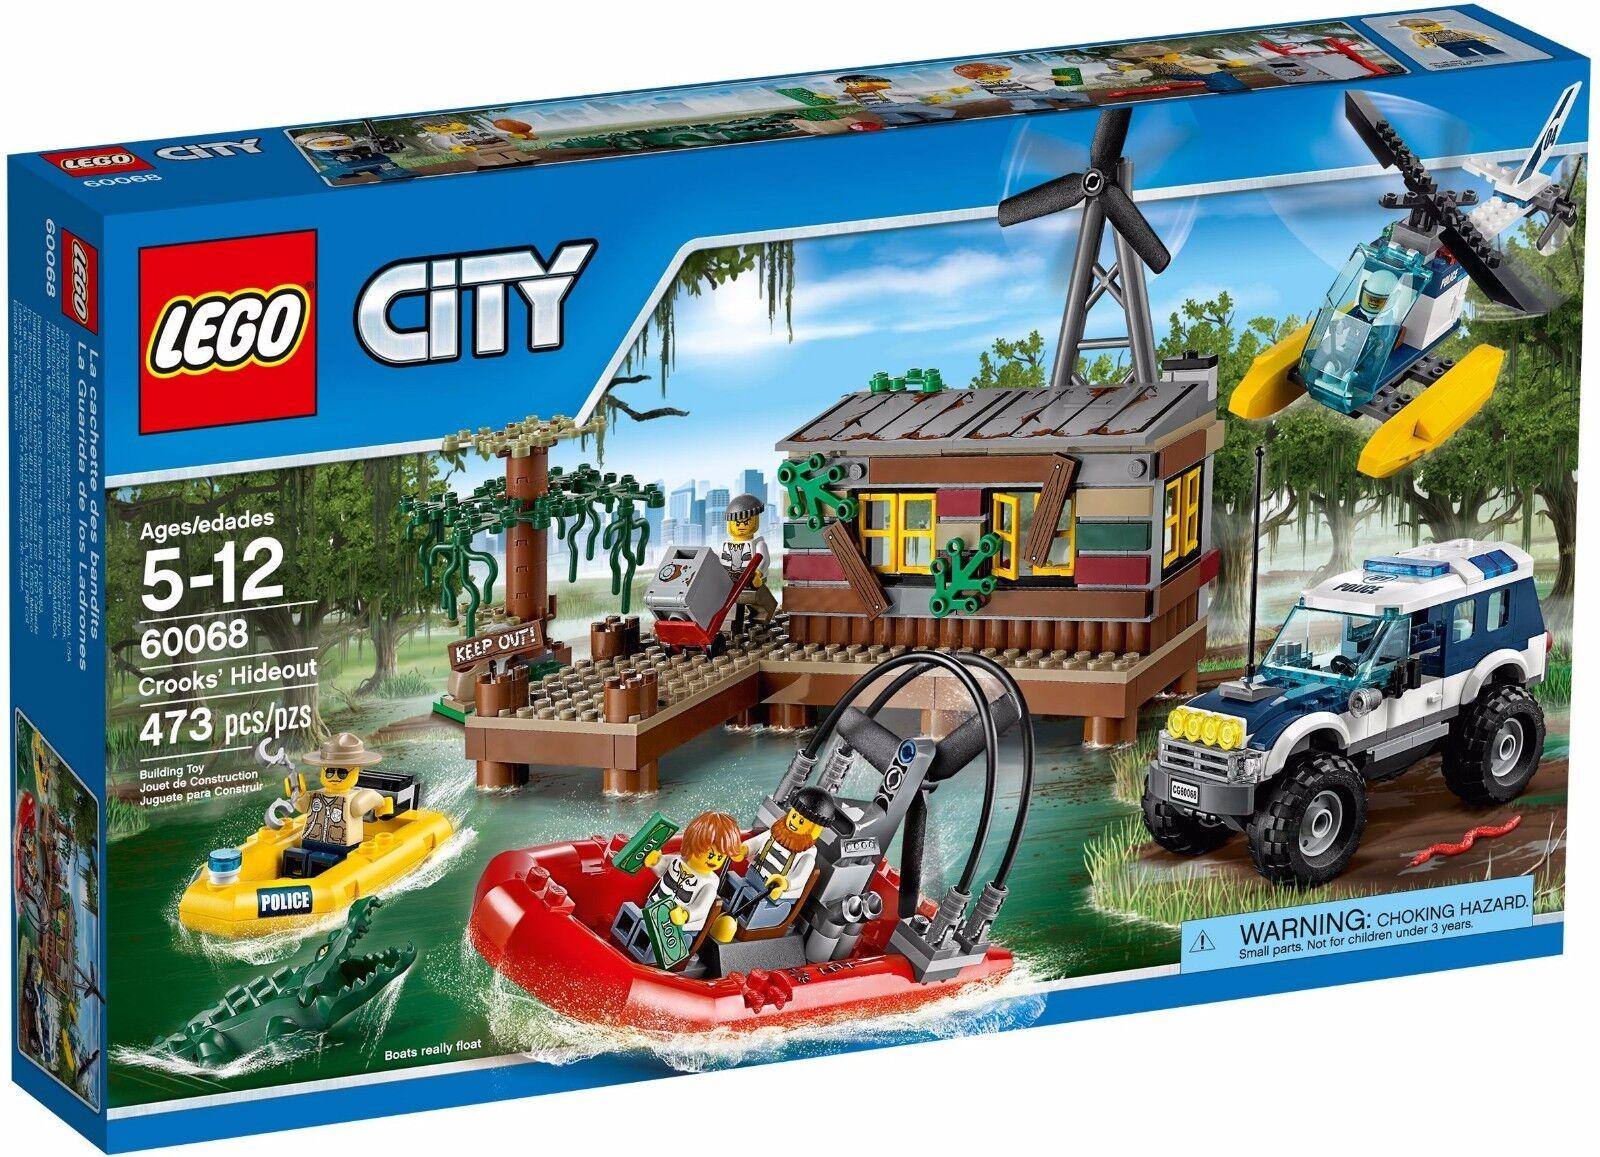 LEGO City Crooks Hideout   60068  Retirosso 2015  Rare  NEW